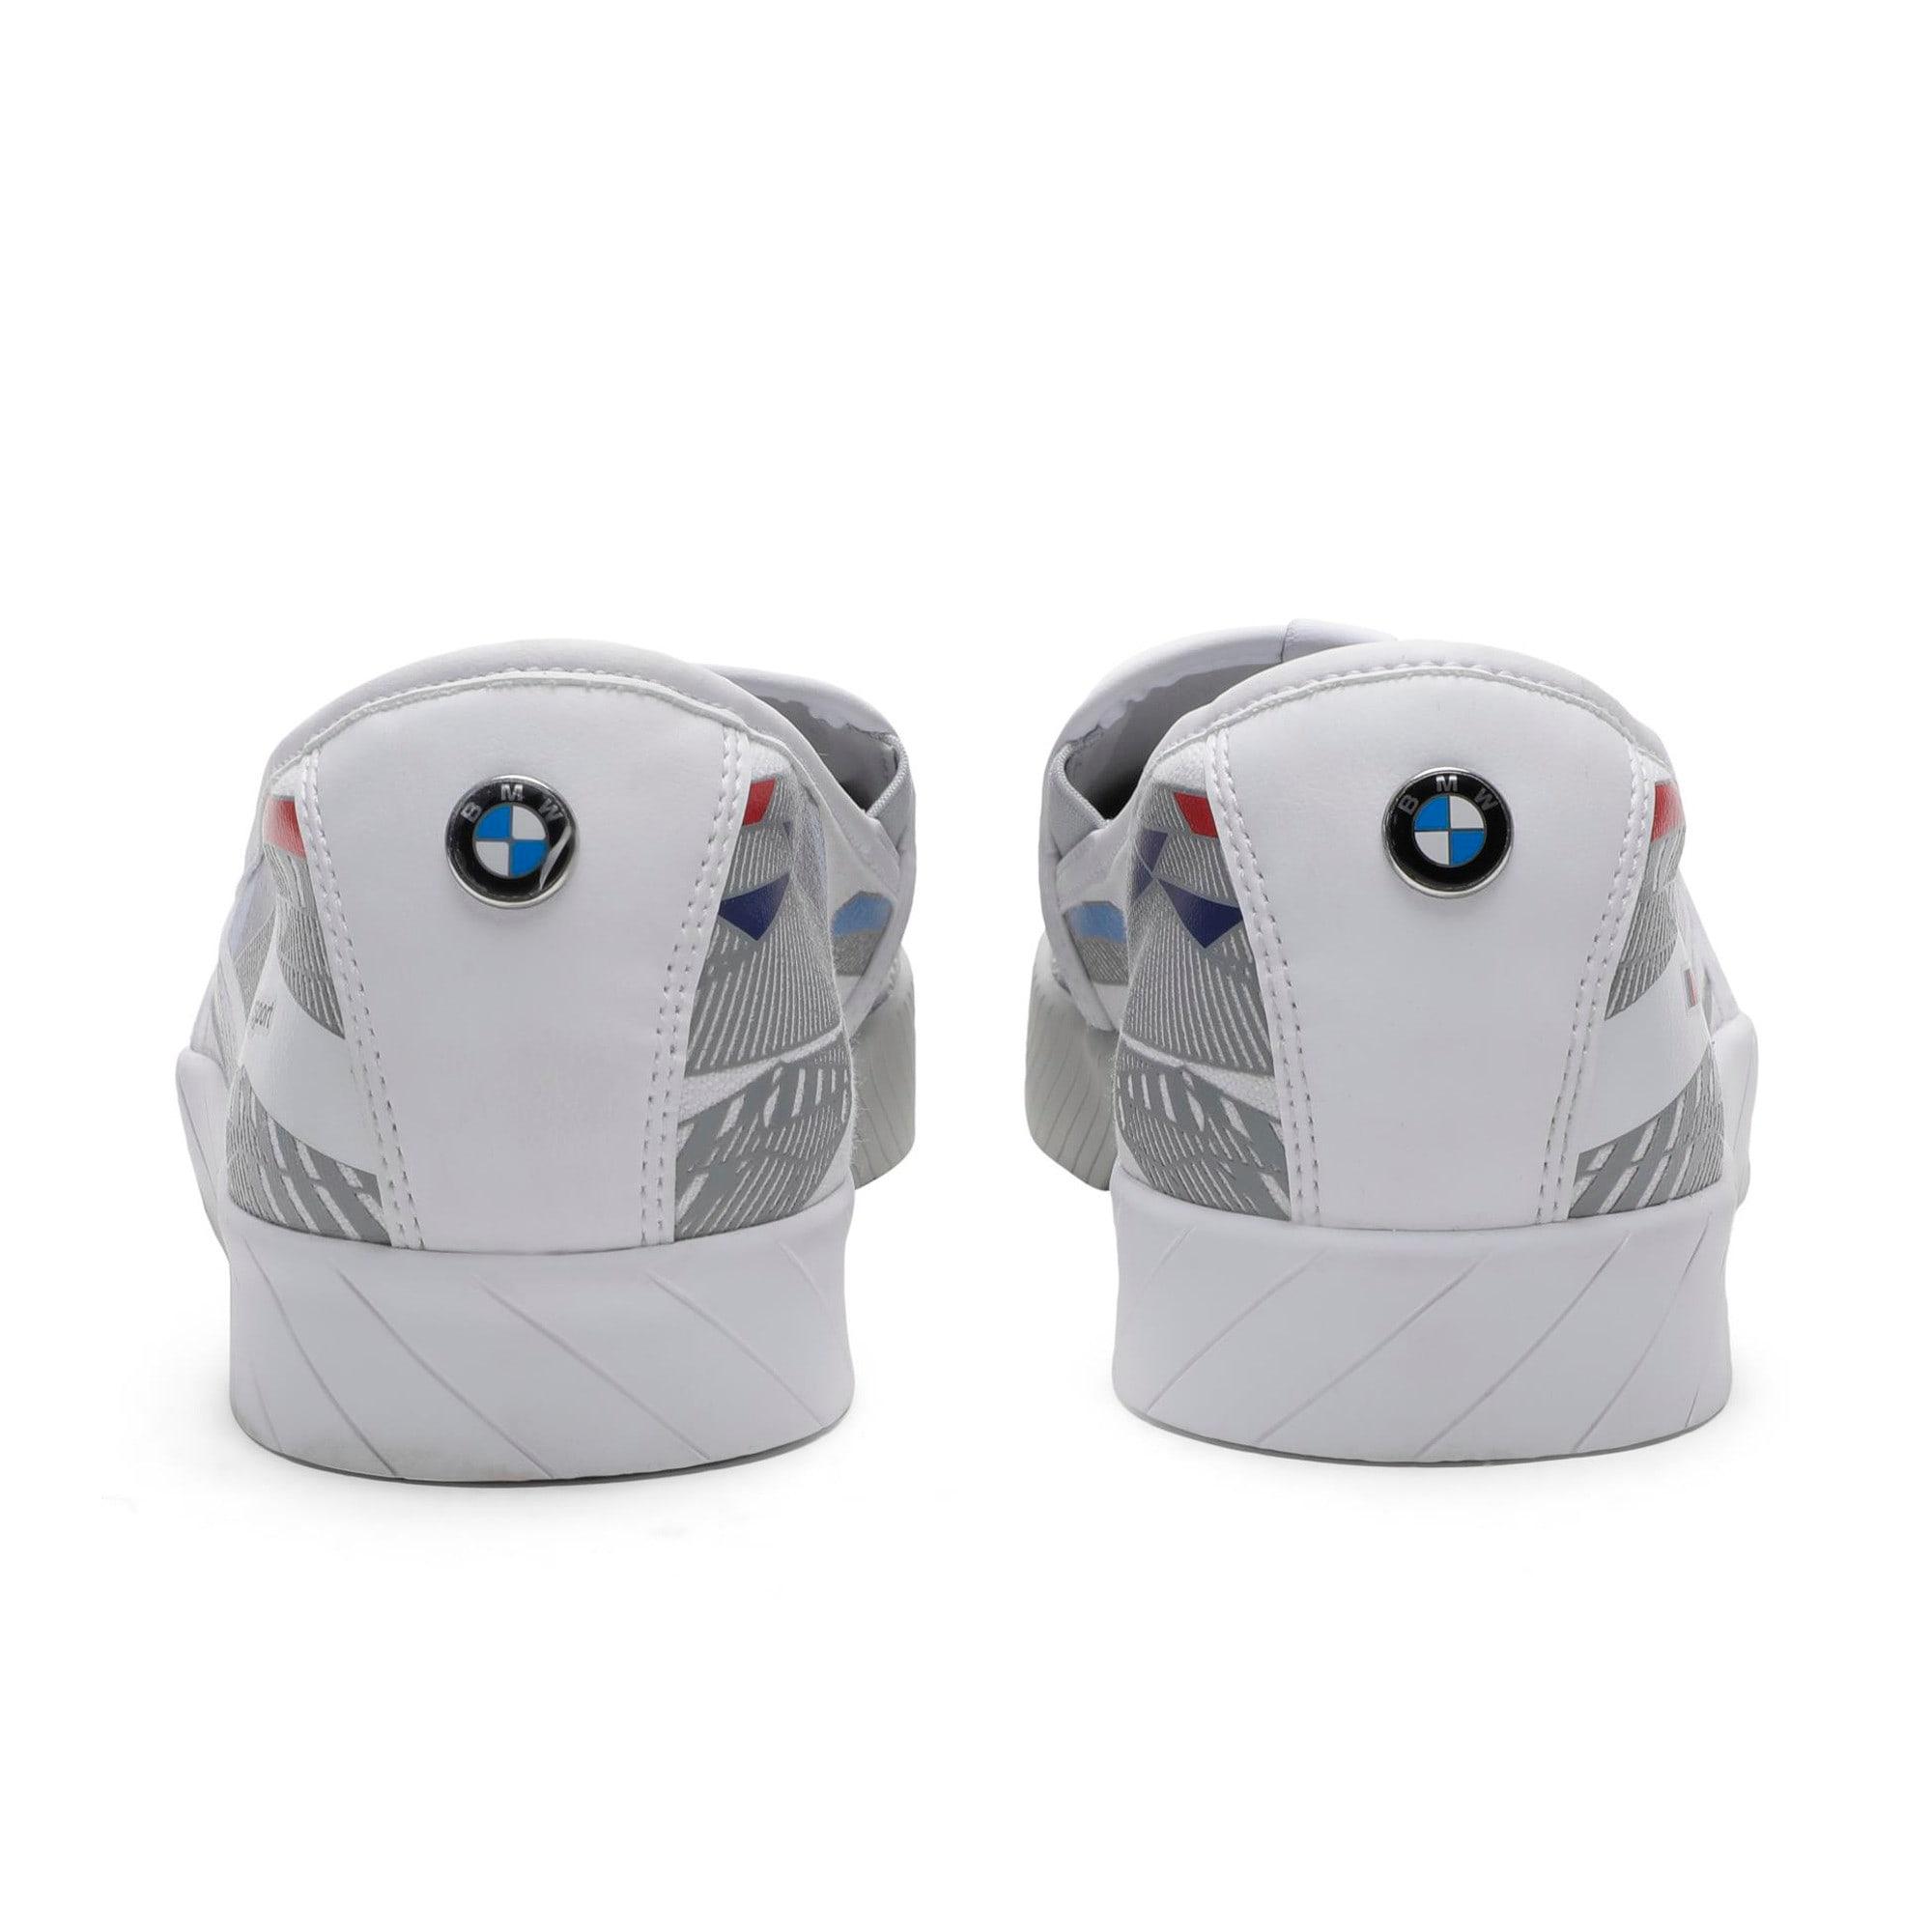 Thumbnail 5 of BMW M Slip-On Track Shoes, Puma White-Gray Violet, medium-IND